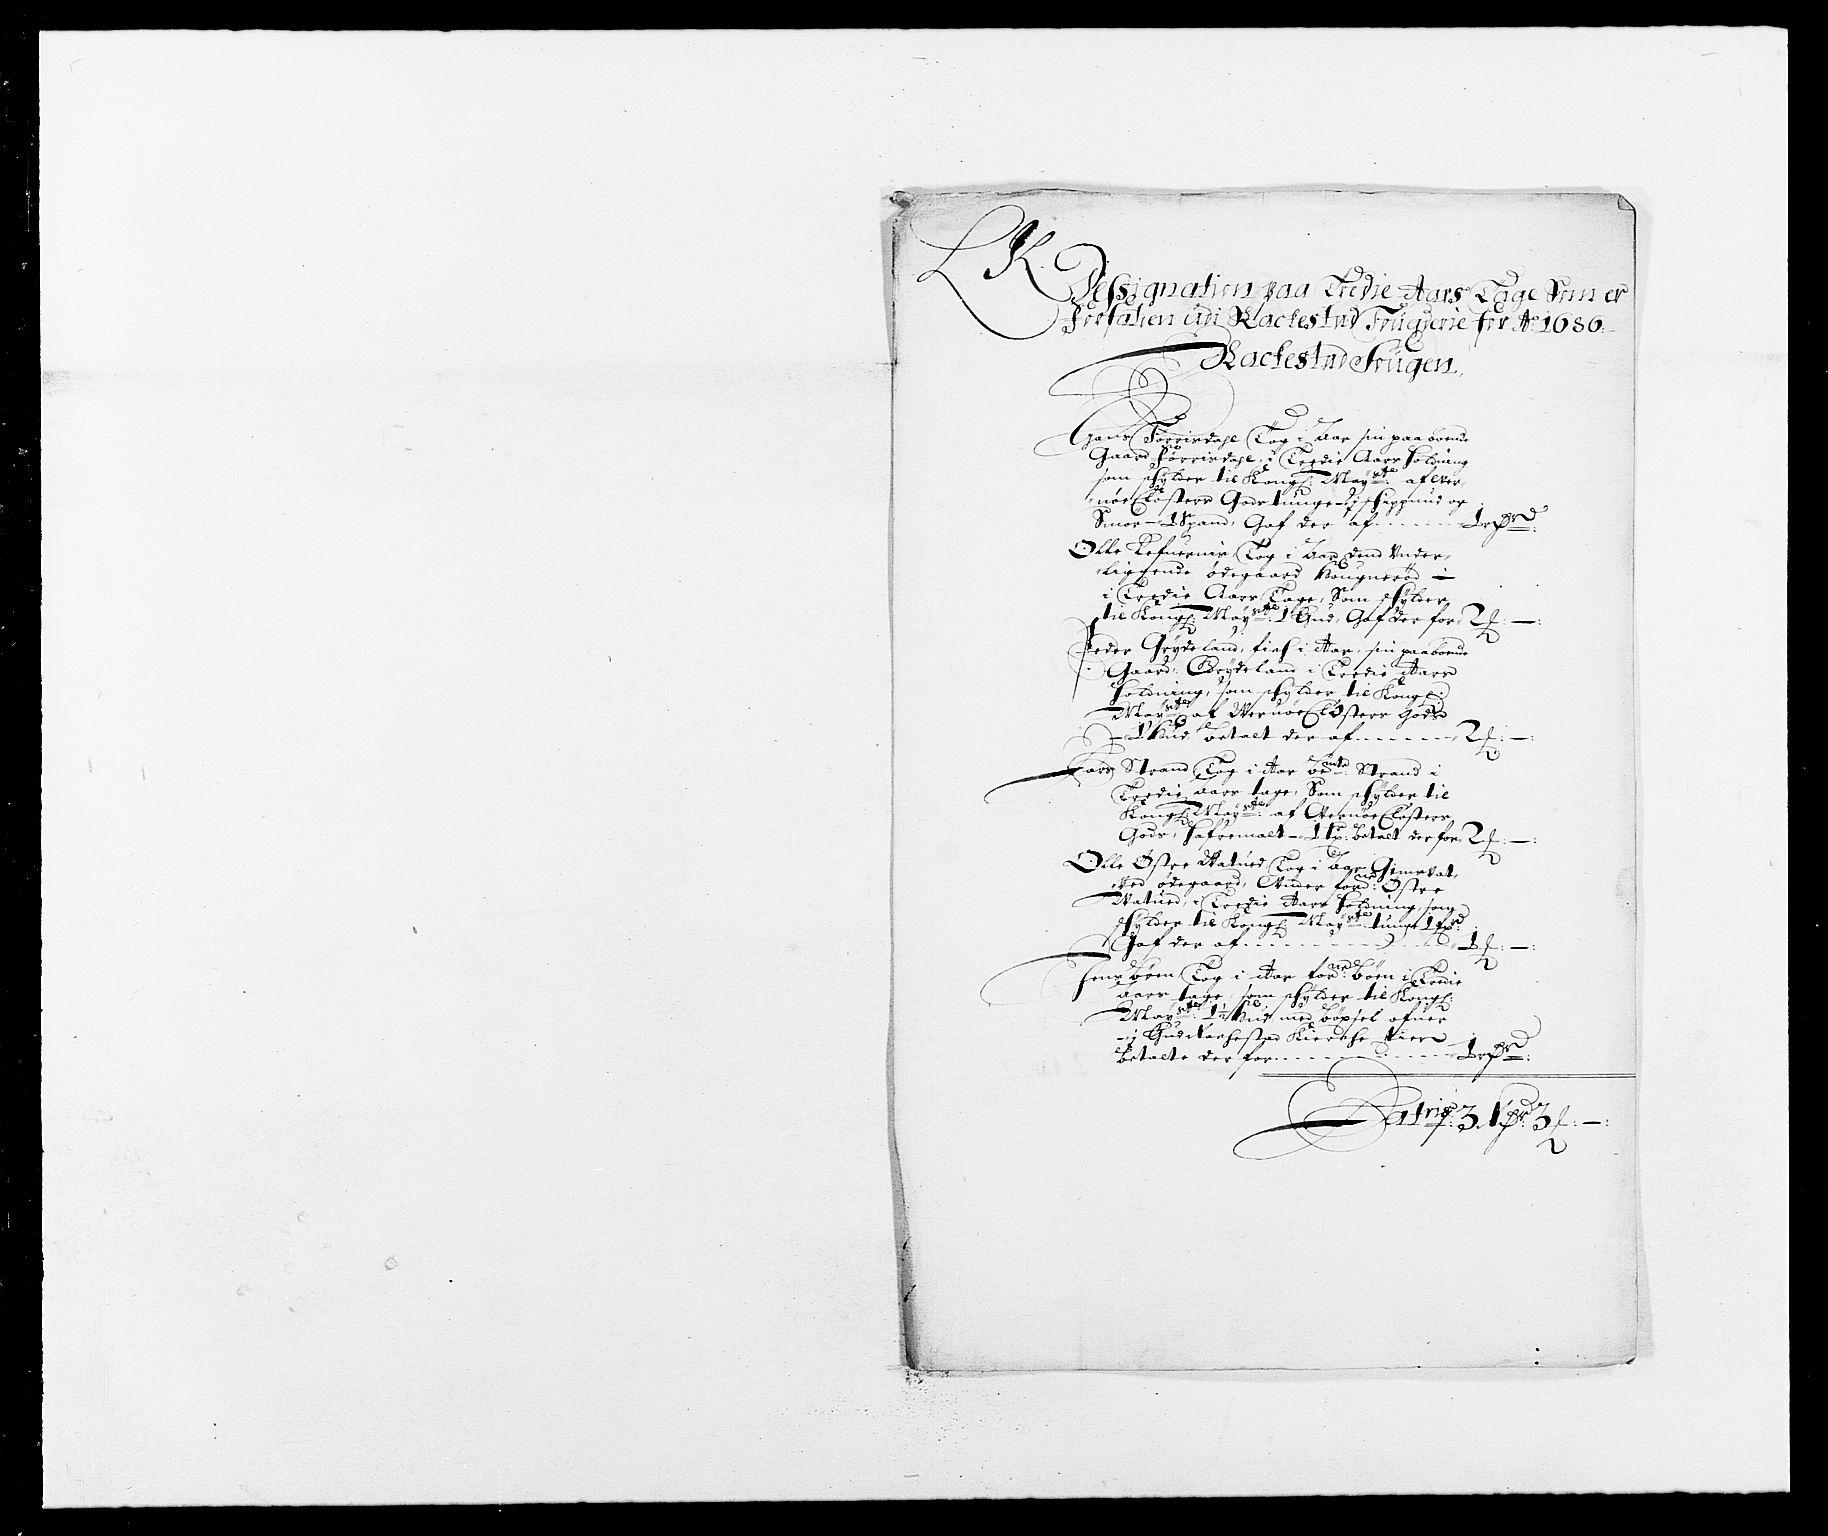 RA, Rentekammeret inntil 1814, Reviderte regnskaper, Fogderegnskap, R05/L0275: Fogderegnskap Rakkestad, 1685-1686, s. 188